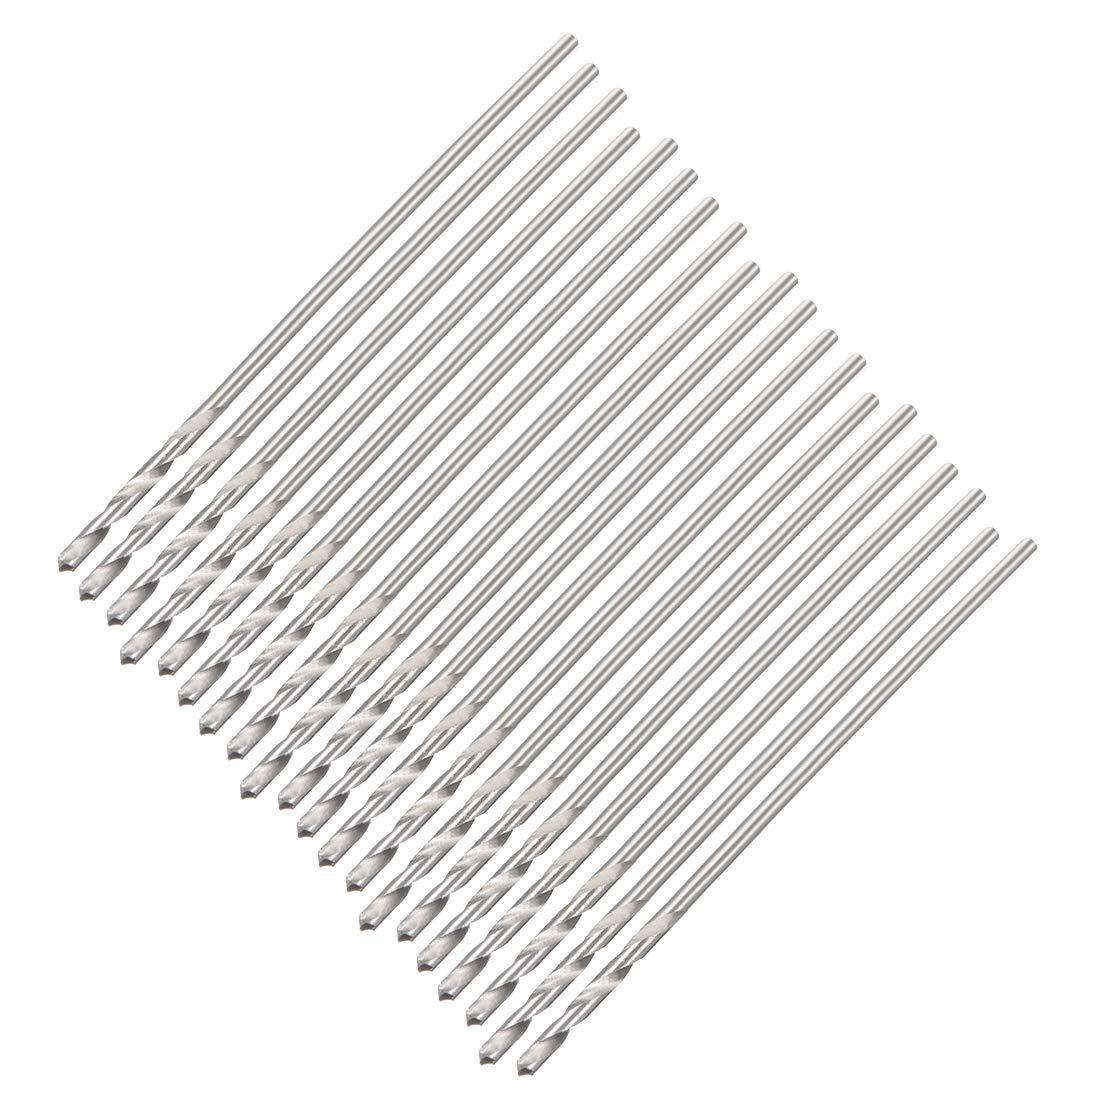 uxcell 0.7mm Twist Drill High Speed Steel Bit HSS M35 5/% Co for Steel,Copper,Aluminum Alloy 20pcs